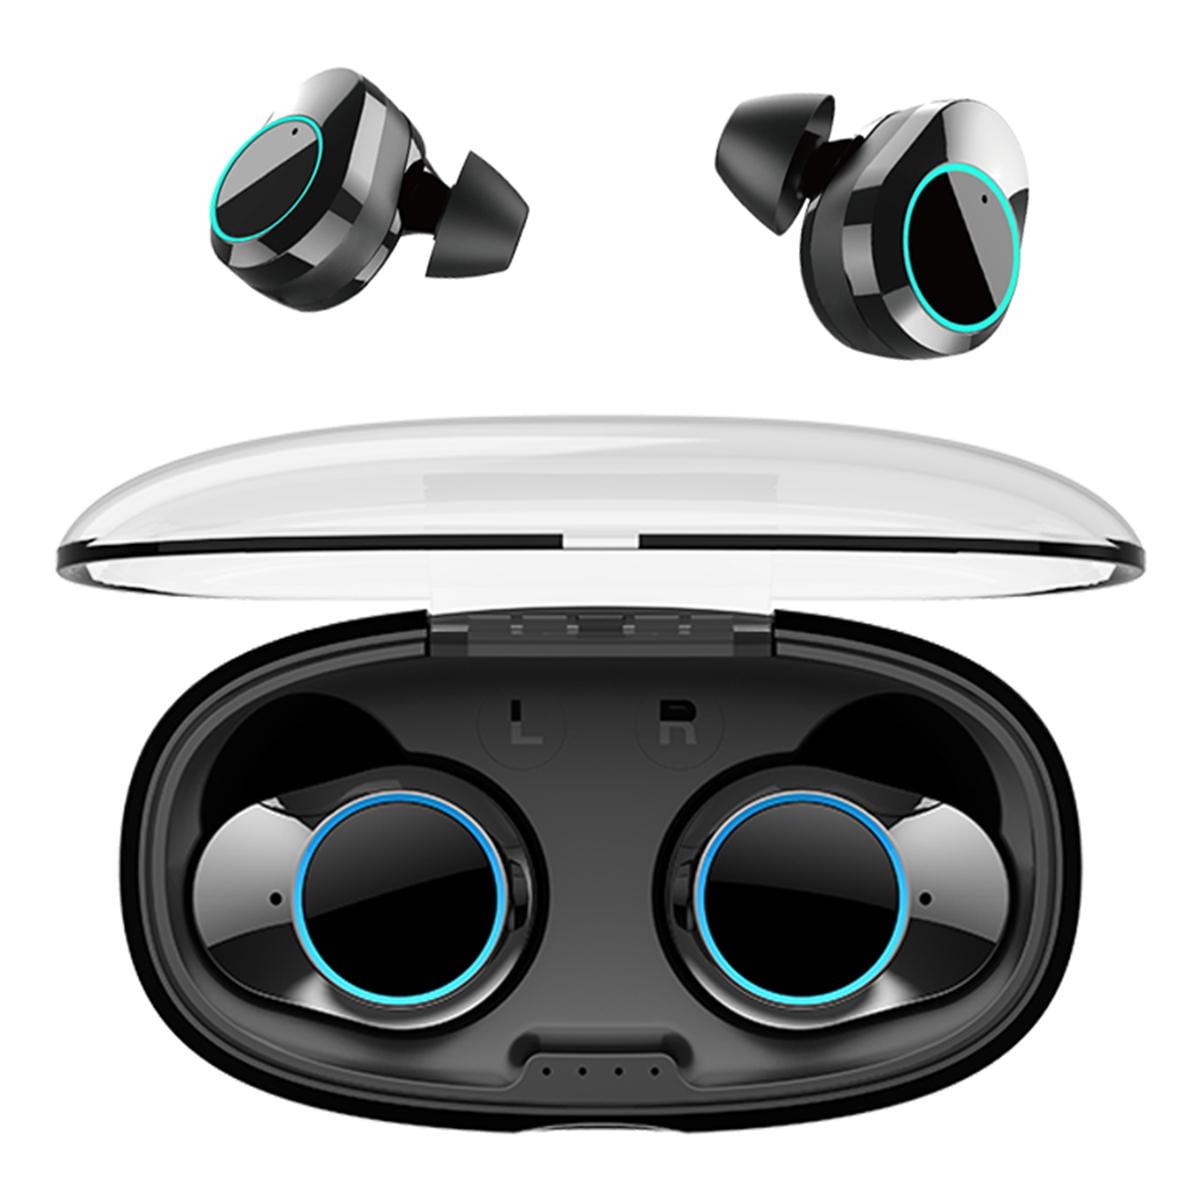 T2C TWS Bluetooth 5.0 earphone hifi stereo type-c charging case wholesale china 1 (1)